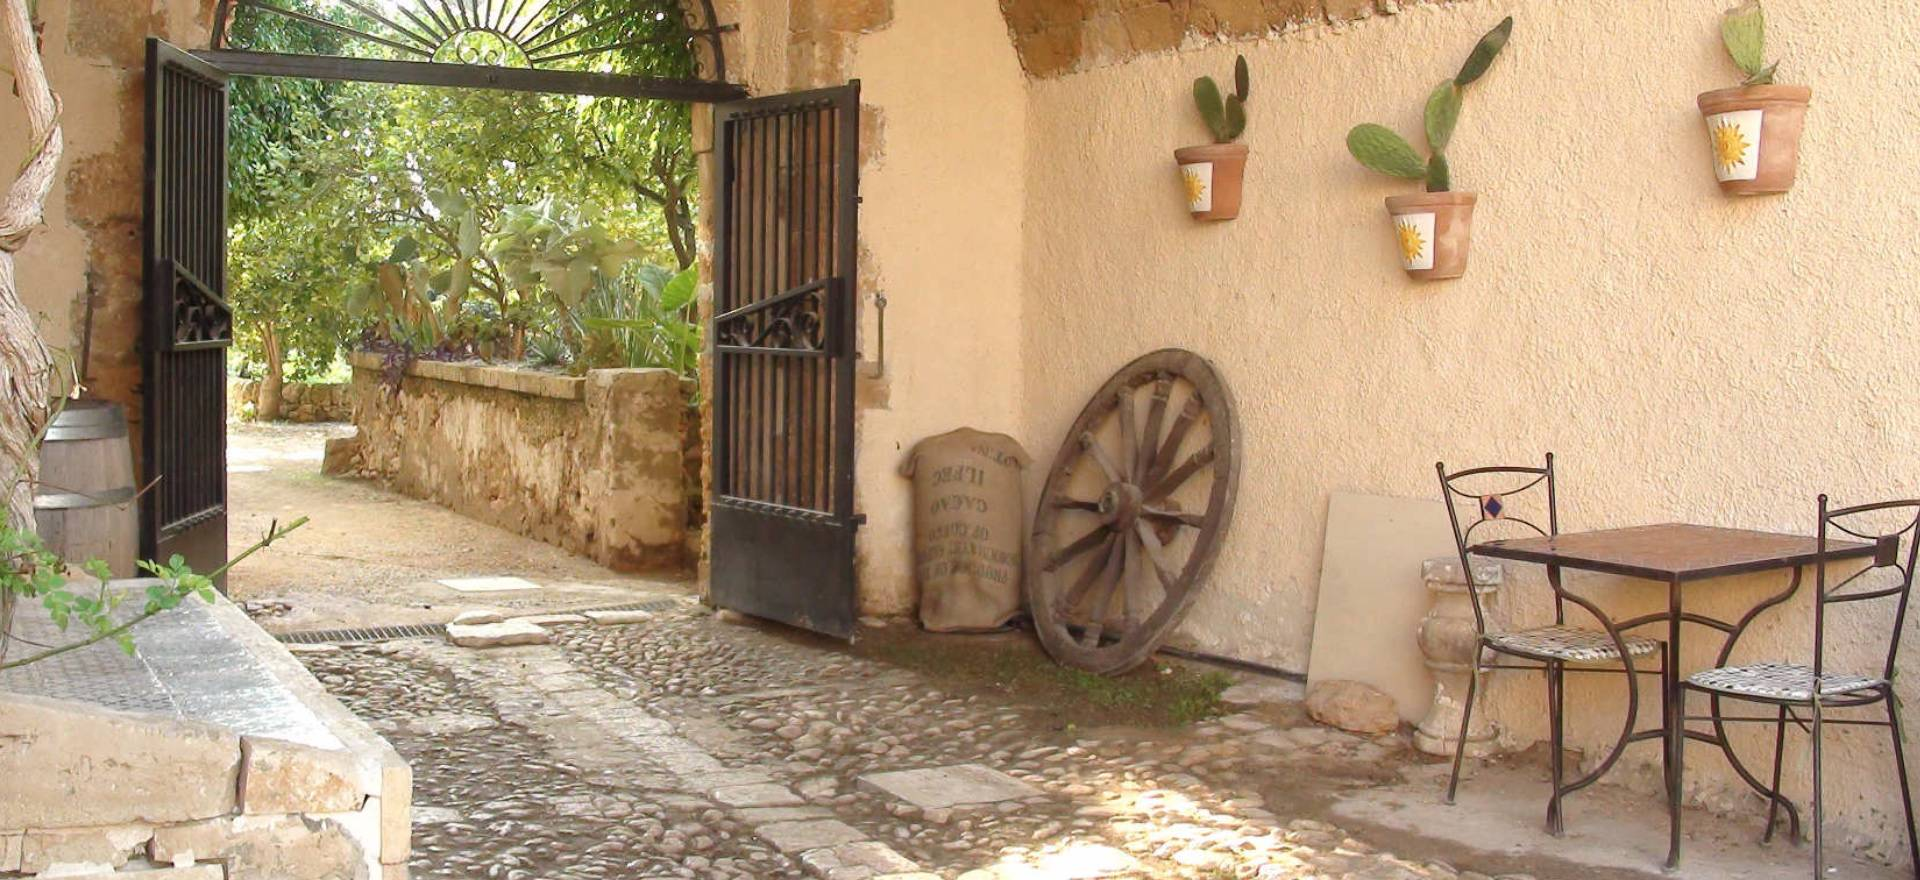 Agriturismo Sicilie Agriturismo met karakteristieke binnenplaats, vlakbij zee